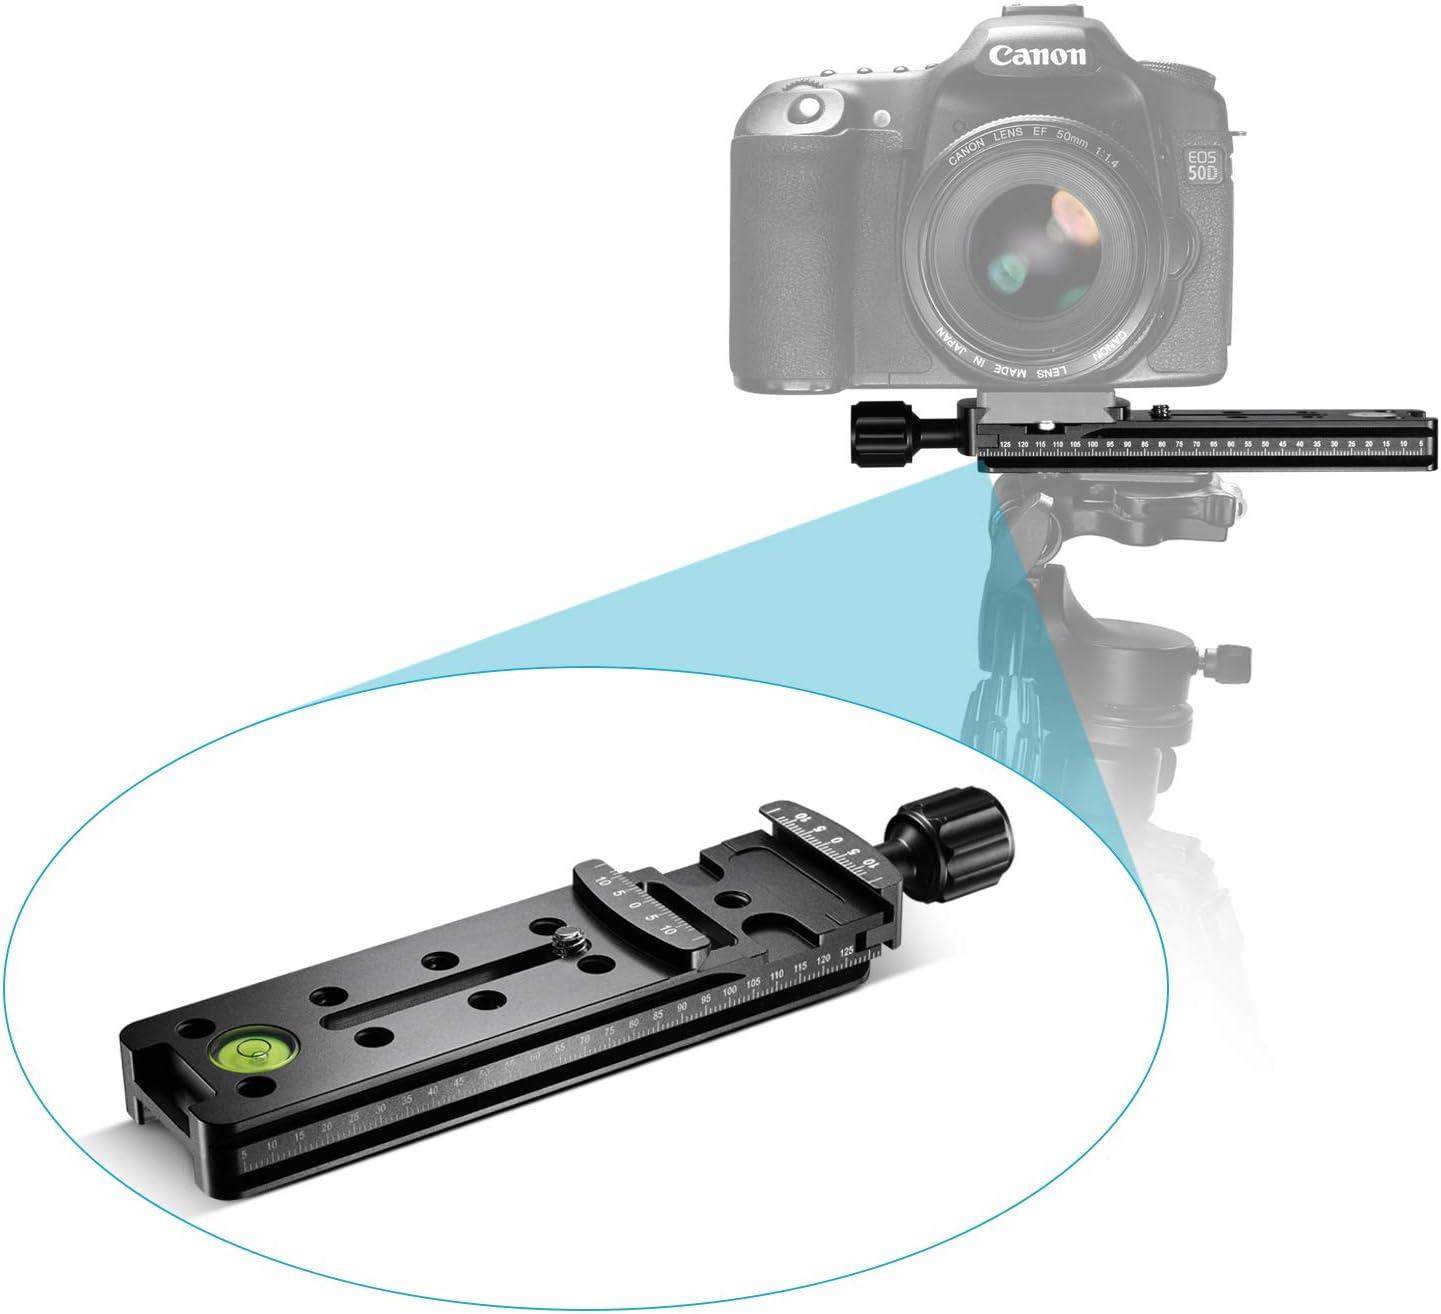 Ychaoya Camera Stand NNR-100 Multi-Purpose 100mm Nodal Rail Slide Plate QR Clamp Macro Panoramic Bracket